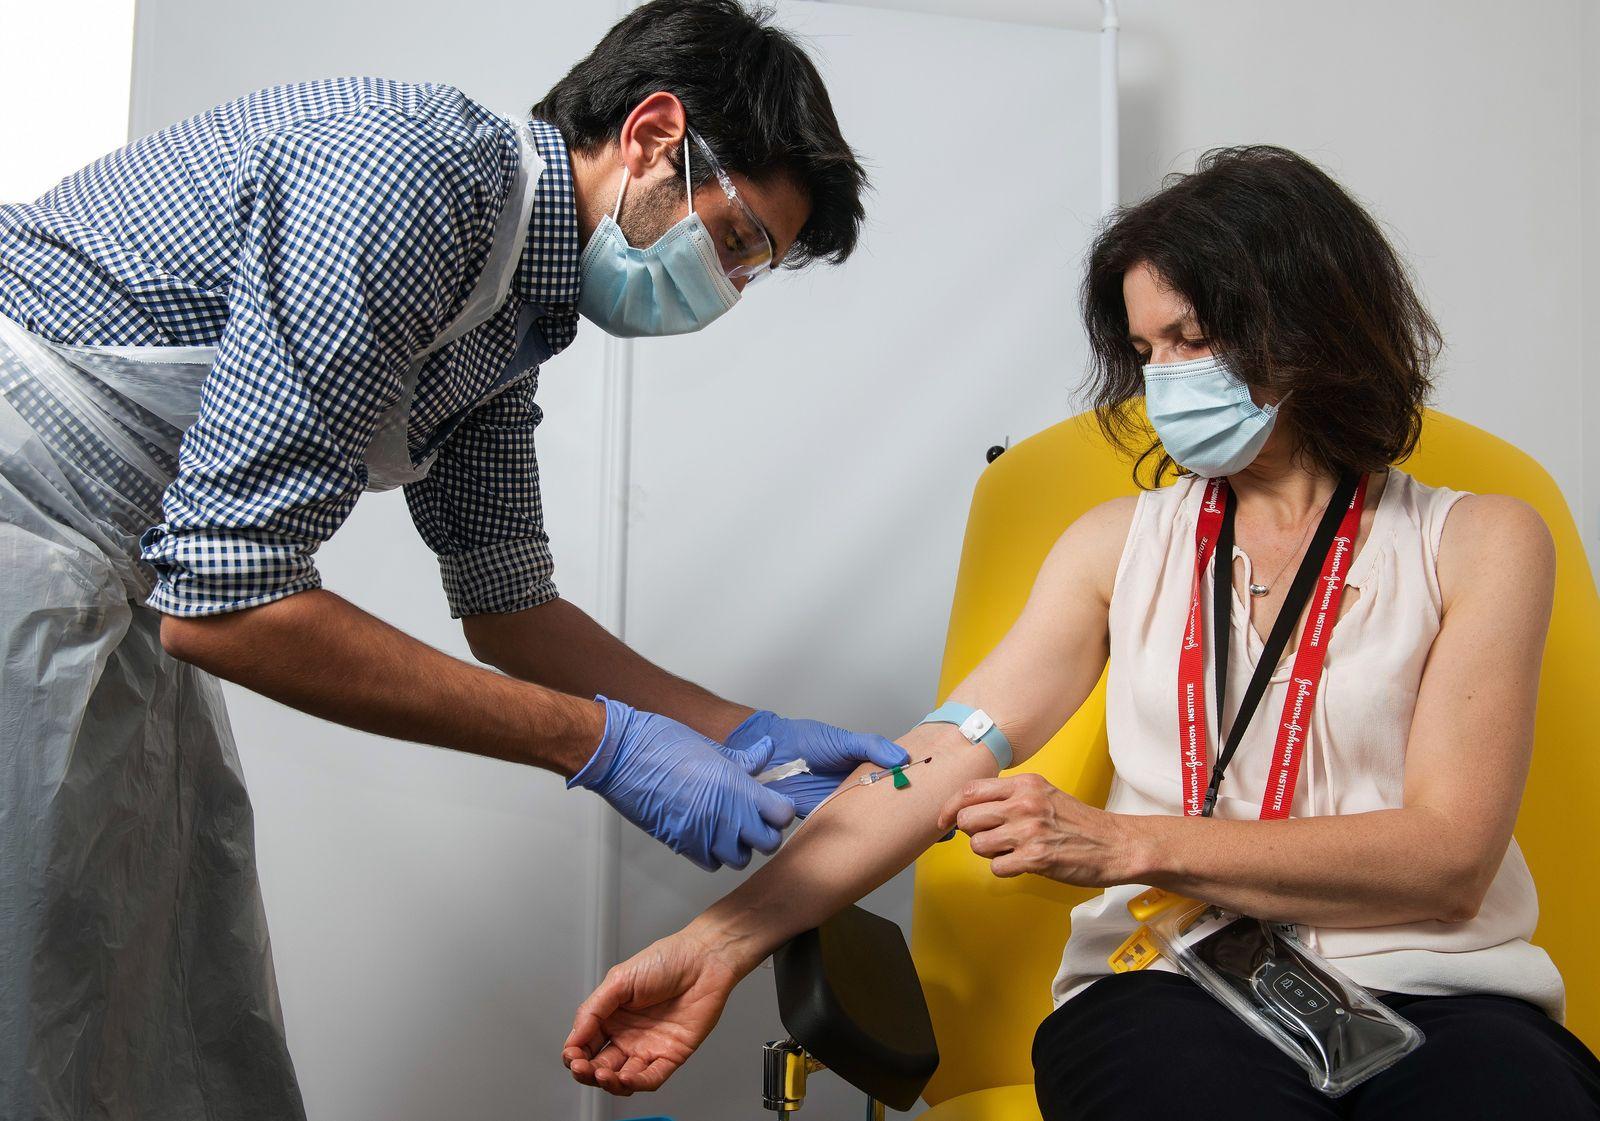 Vacina de Oxford: desenvolvimento e resultados da vacina contra Covid-19